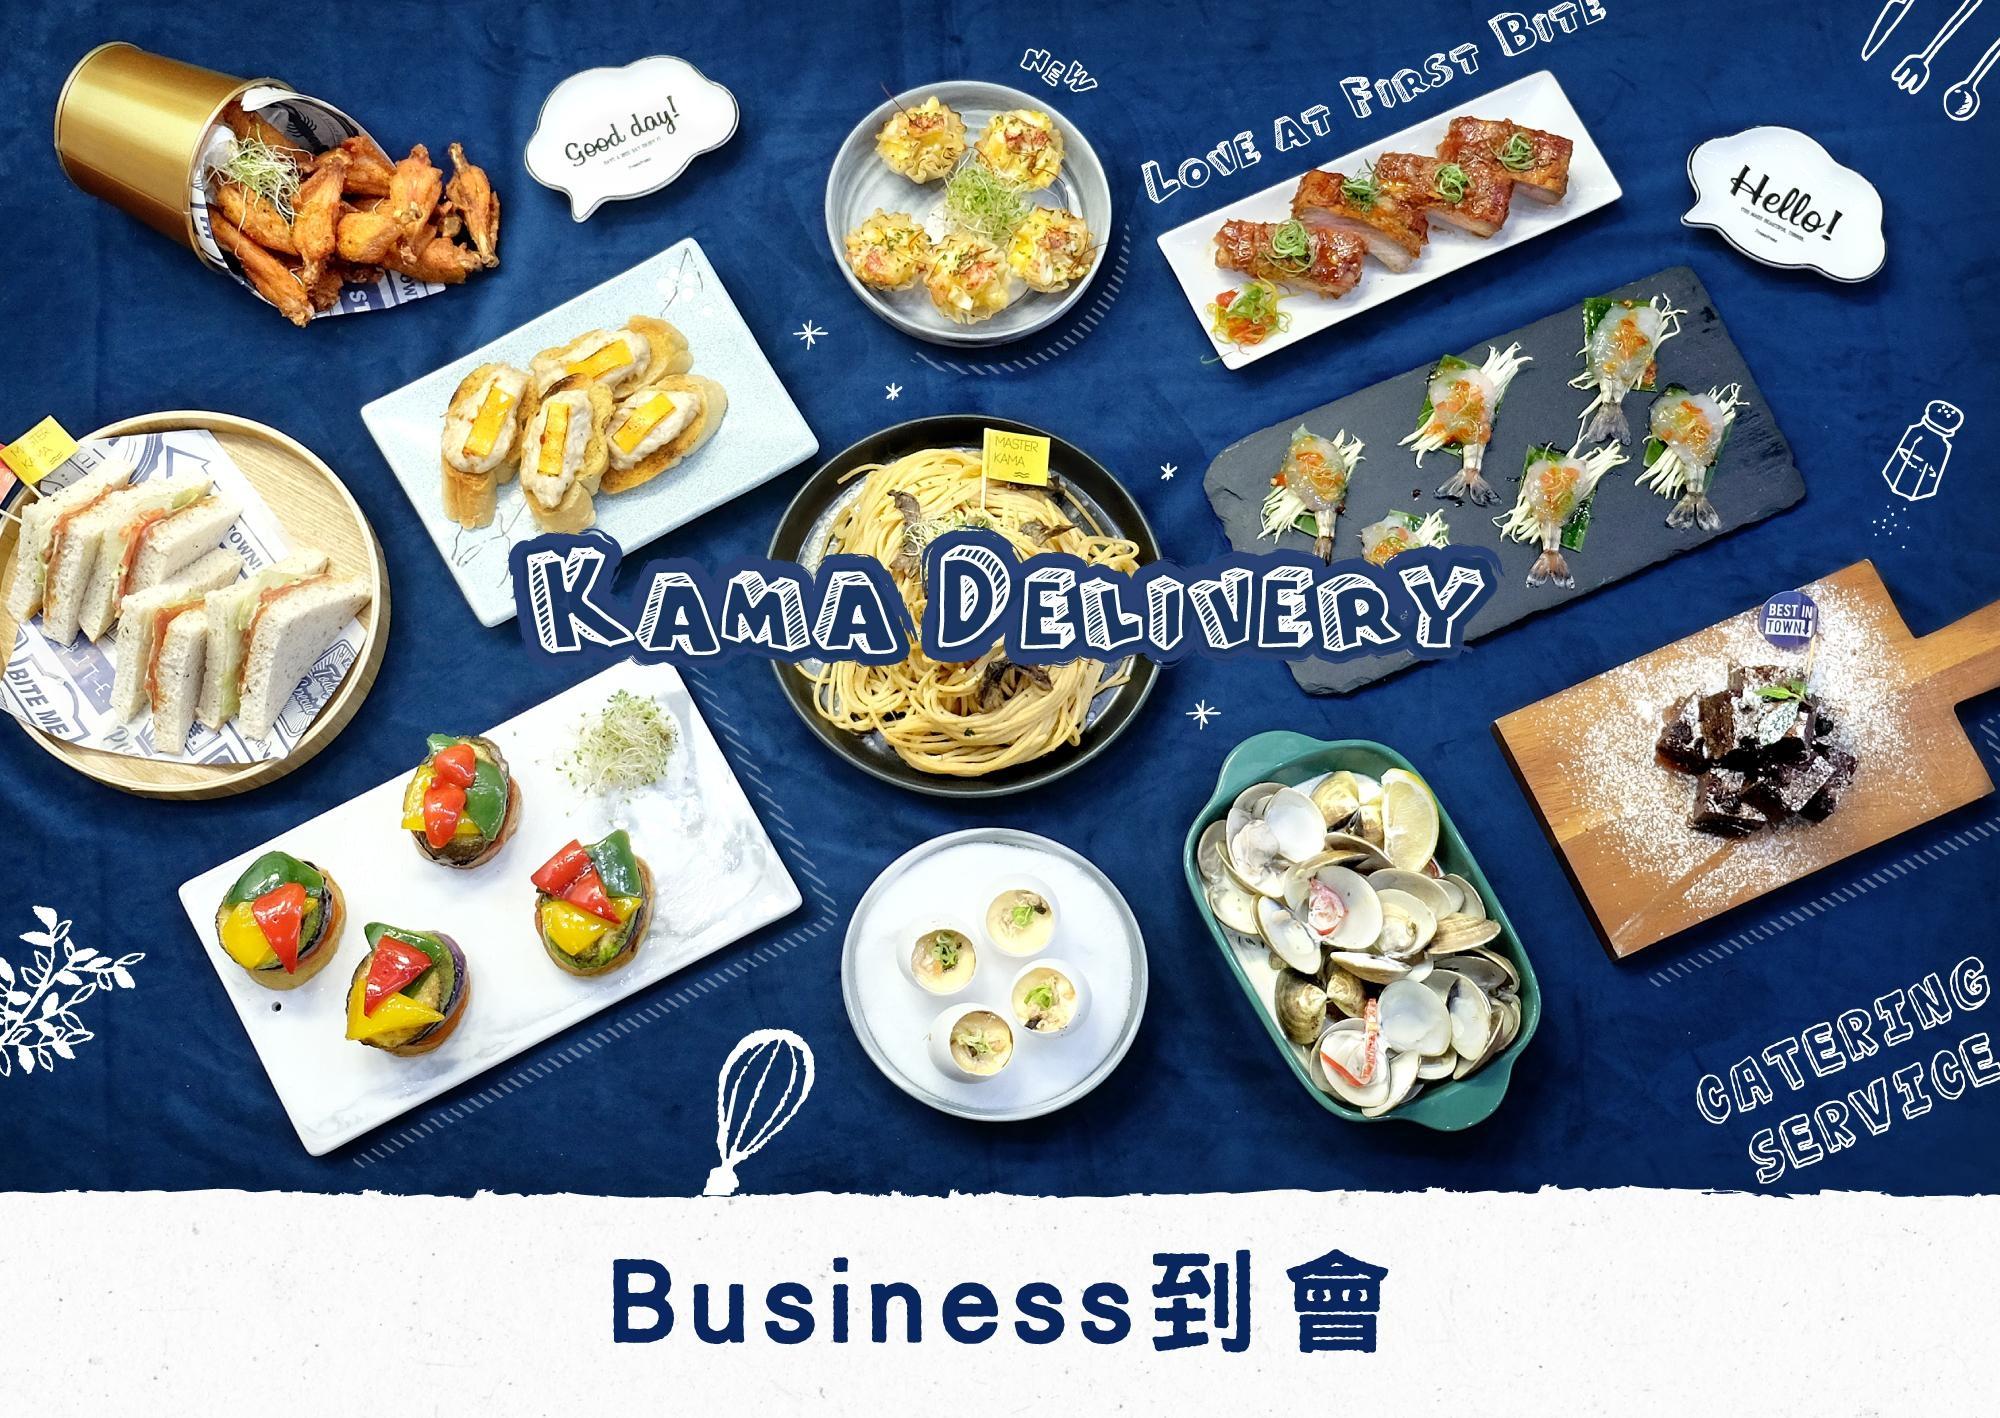 Business到會.推介首選|Kama Delivery美食到會外賣服務提供多款到會套餐外賣運送,我們亦可特地為企業或私人派對制作特定餐單,務求滿足各類派對到會的需求。歡迎聯絡我們查詢到會詳情,並專享各種優惠及回贈!